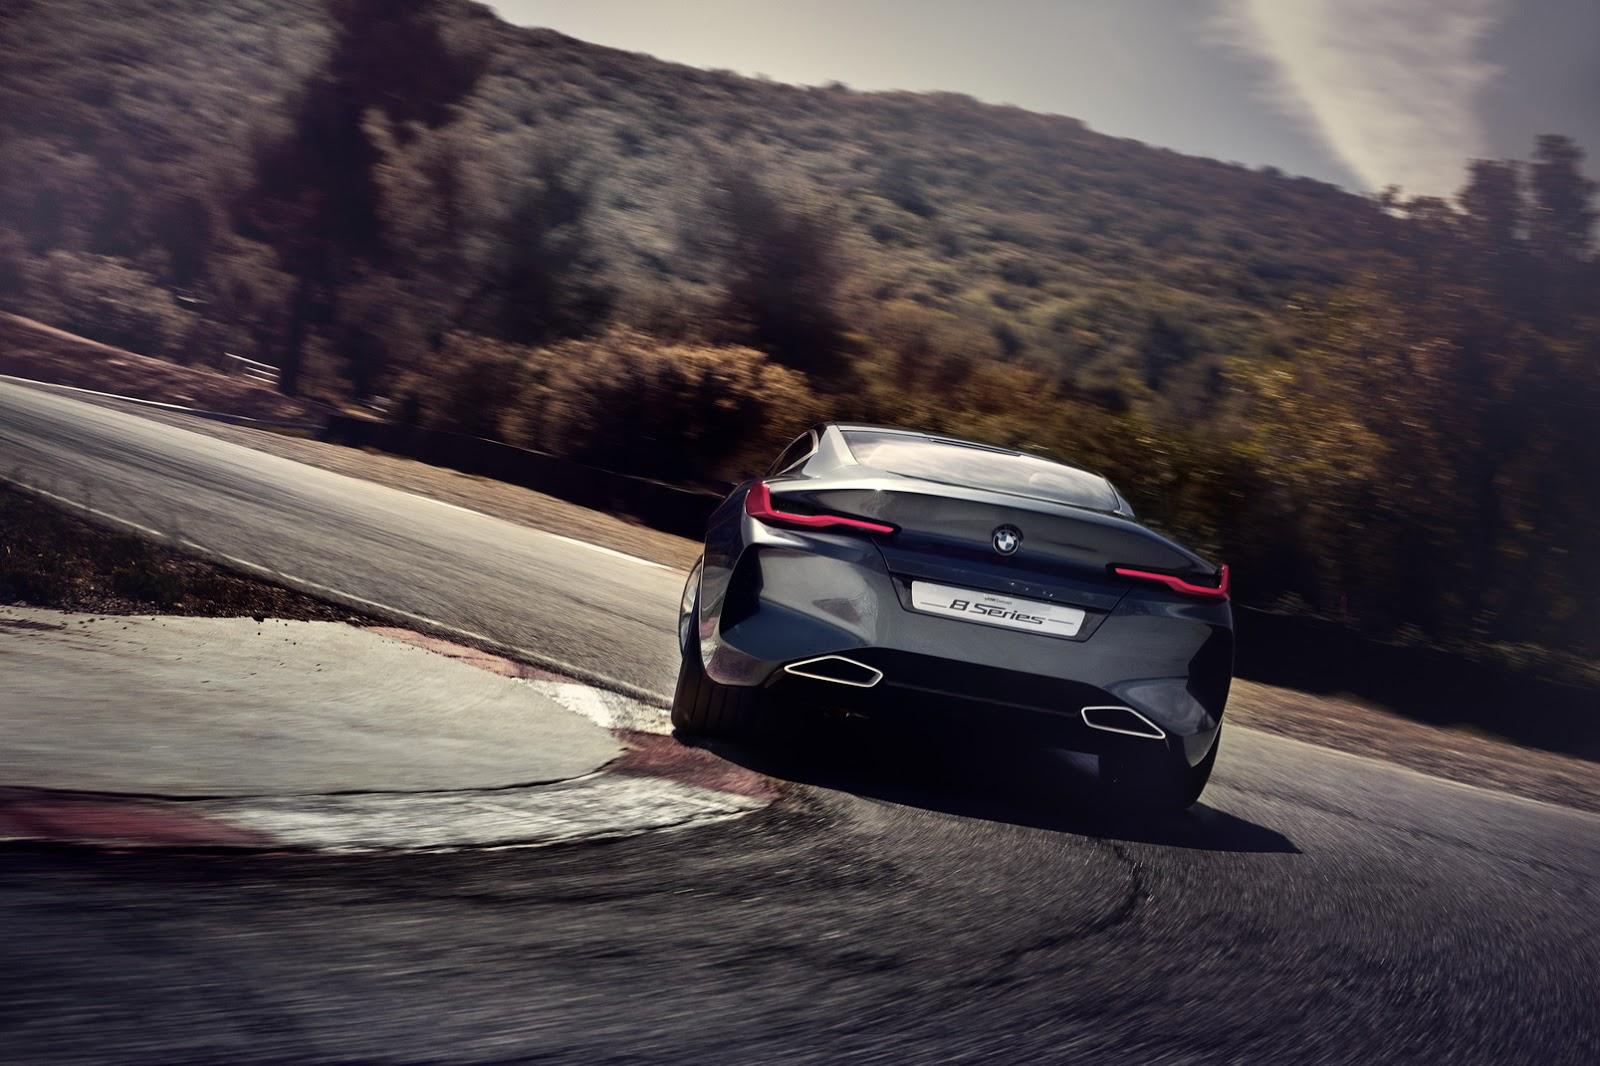 BMW_Concept_8_Series_16